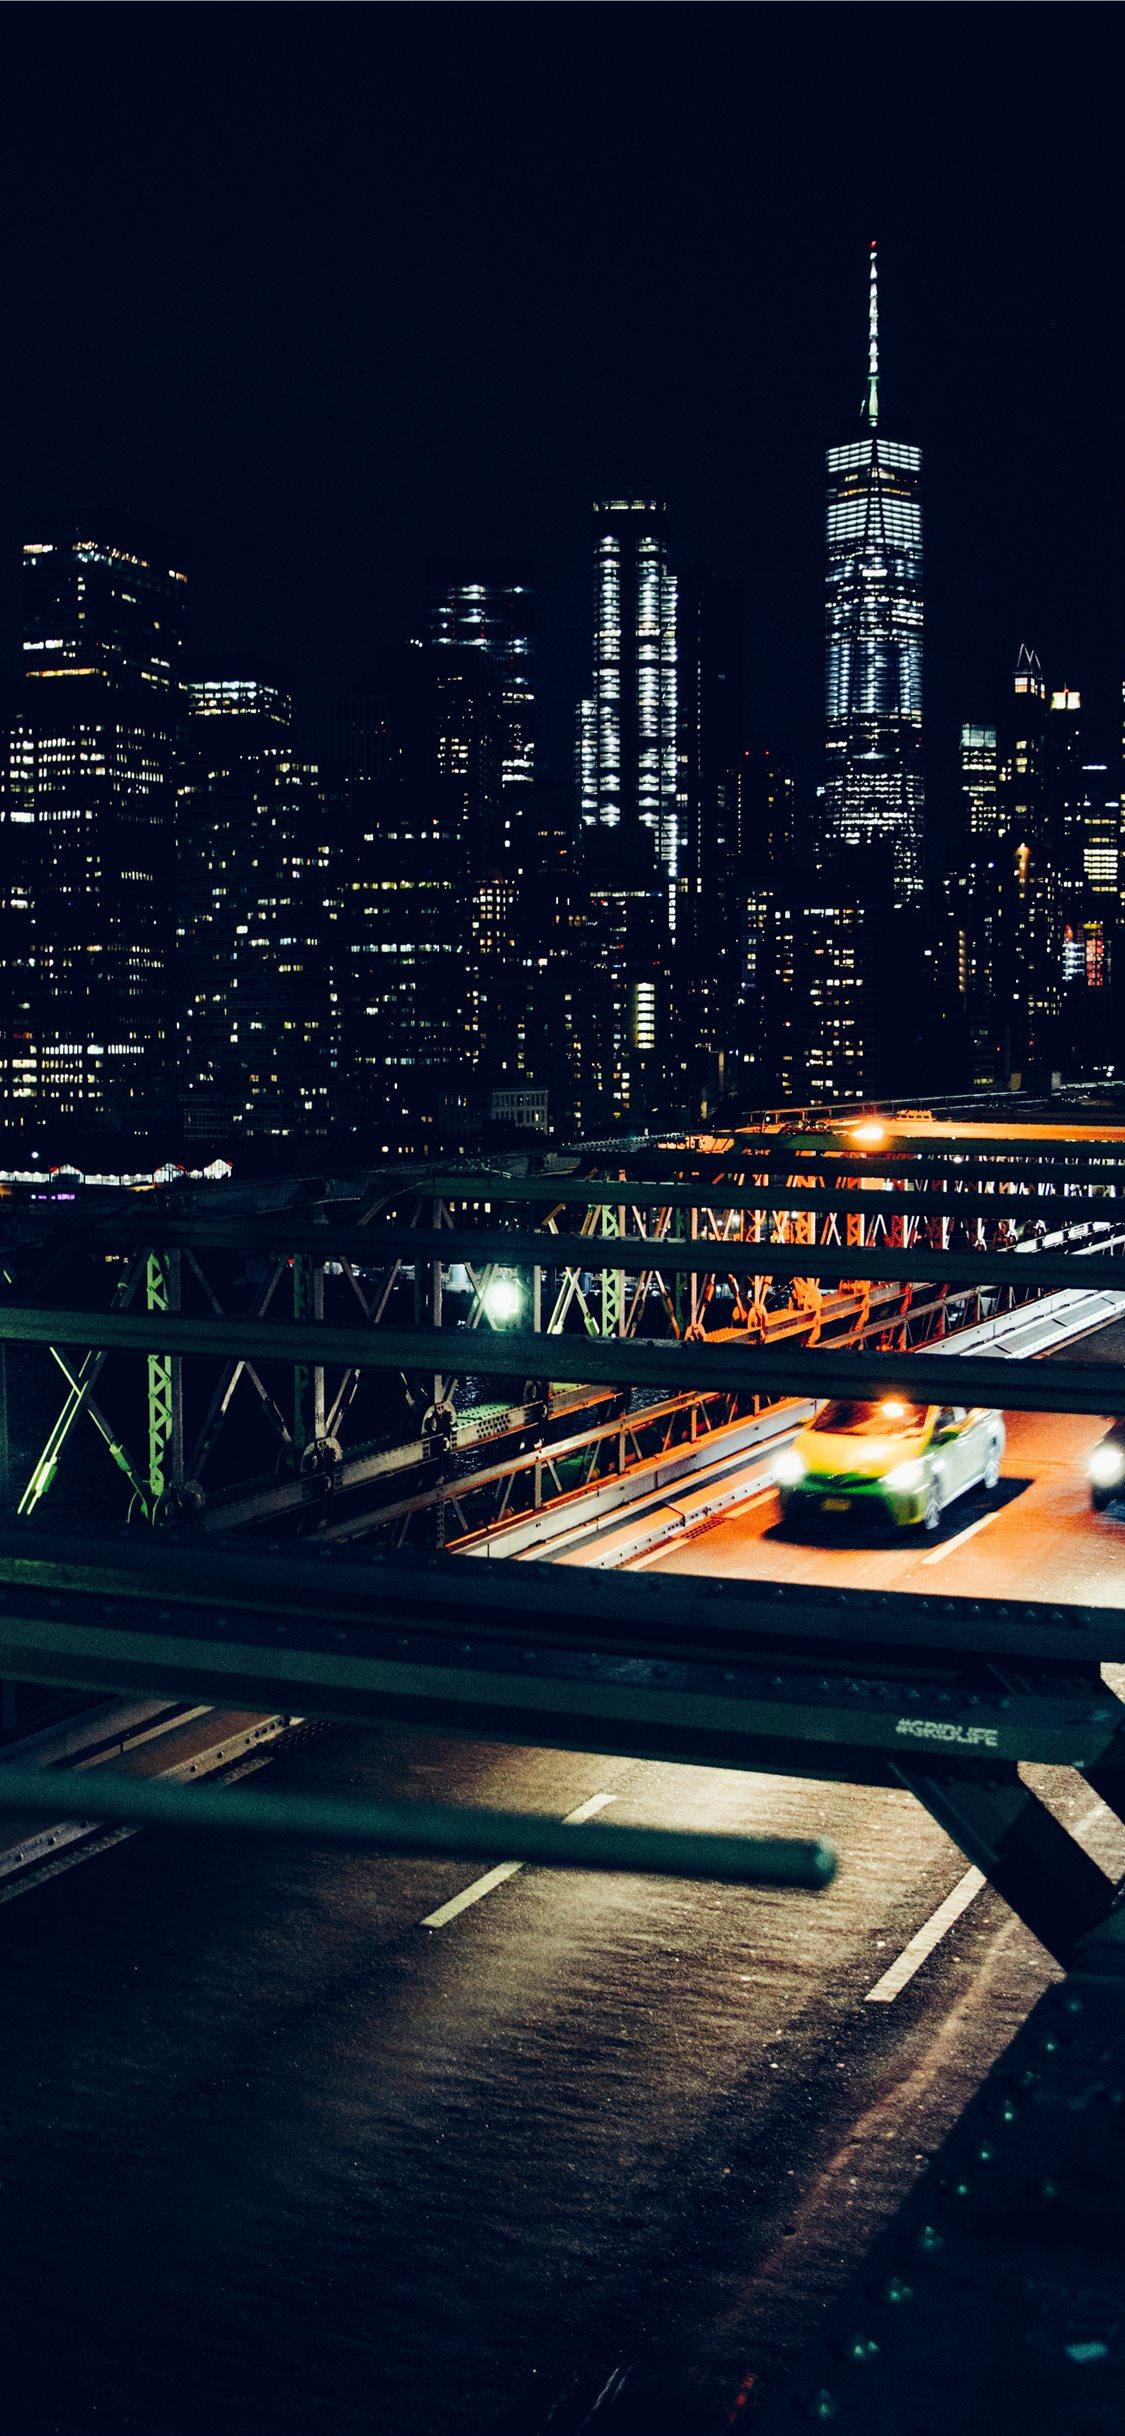 Iphone Xs Max Wallpapers New York 1125x2436 Wallpaper Teahub Io